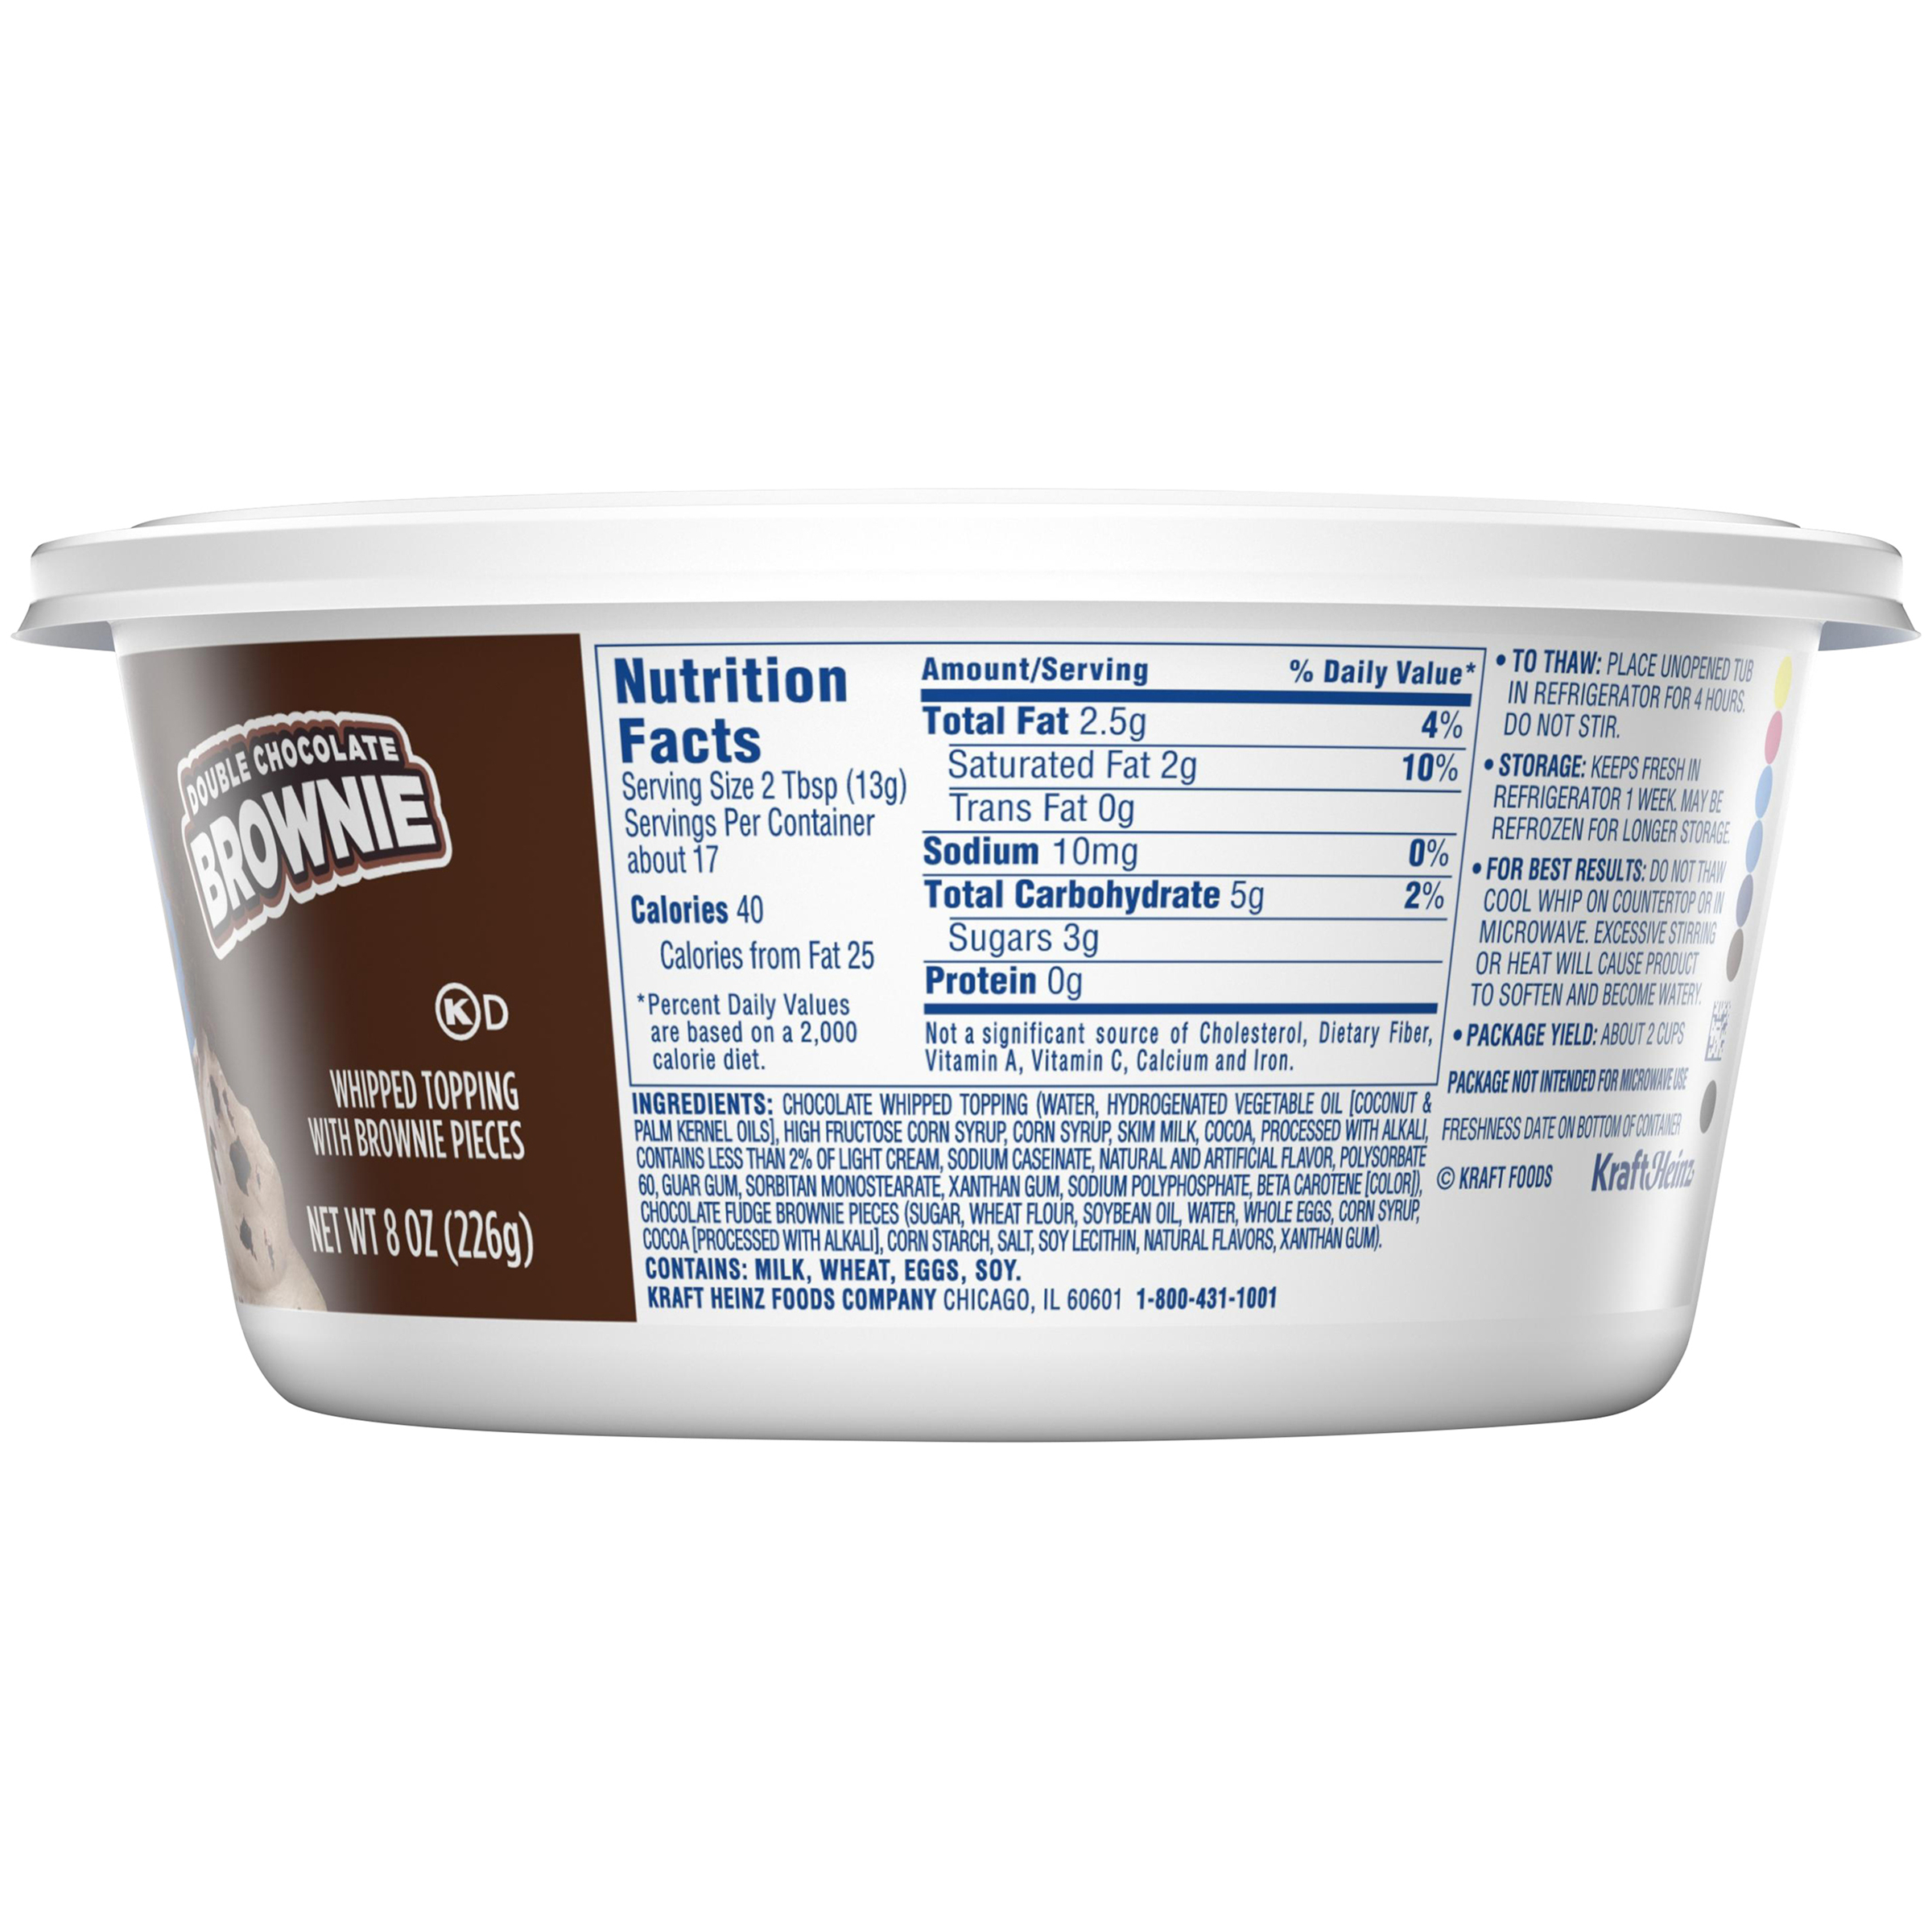 Cool Whip Nutrition Label Juleteagyd